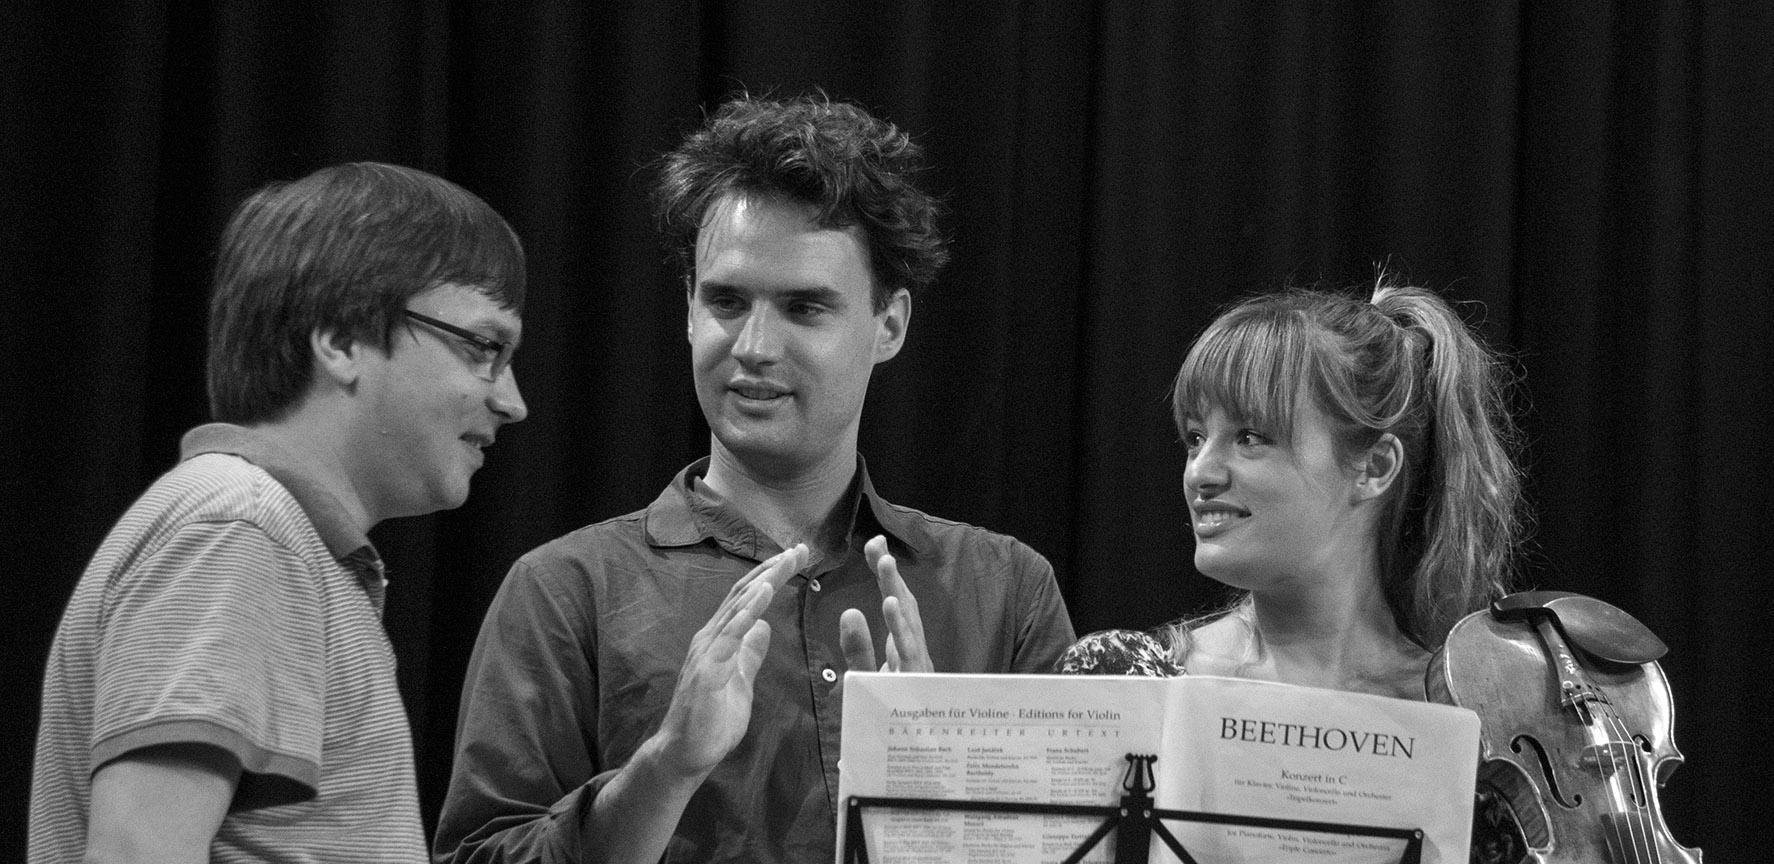 Benedetti-Elschenbroich-Grynyuk-Trio-Credit-Jane-Lawrence.jpg